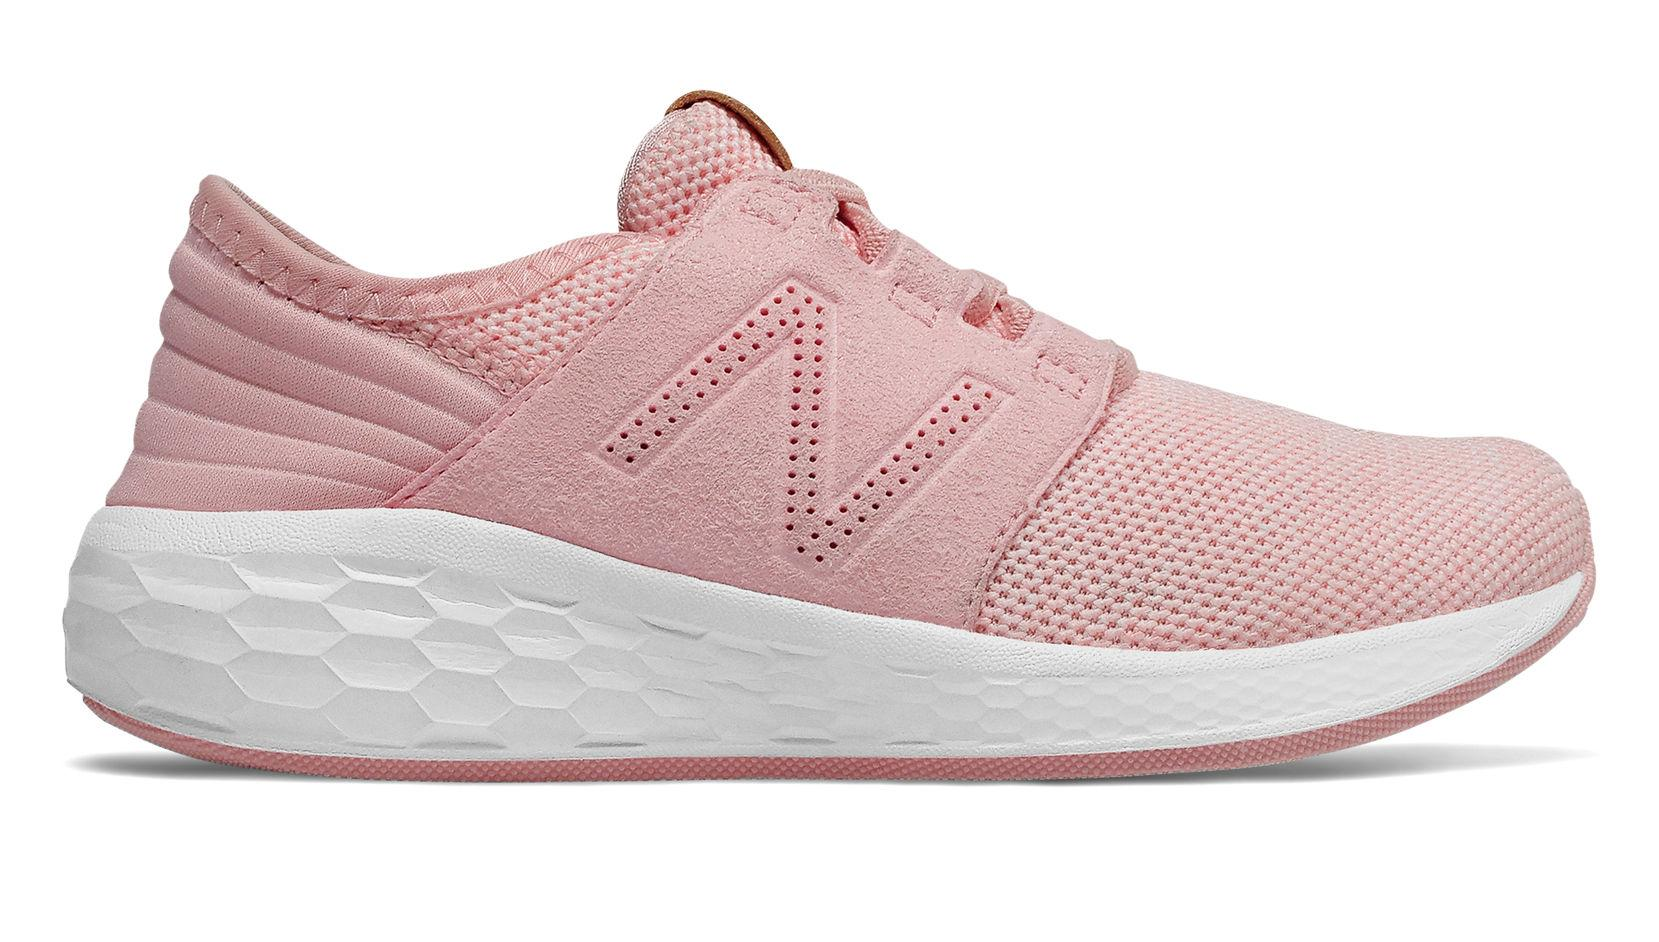 New Balance Fresh Foam Cruz Knit Sepatu Olahraga Anak Perempuan - Pink 85600f894e